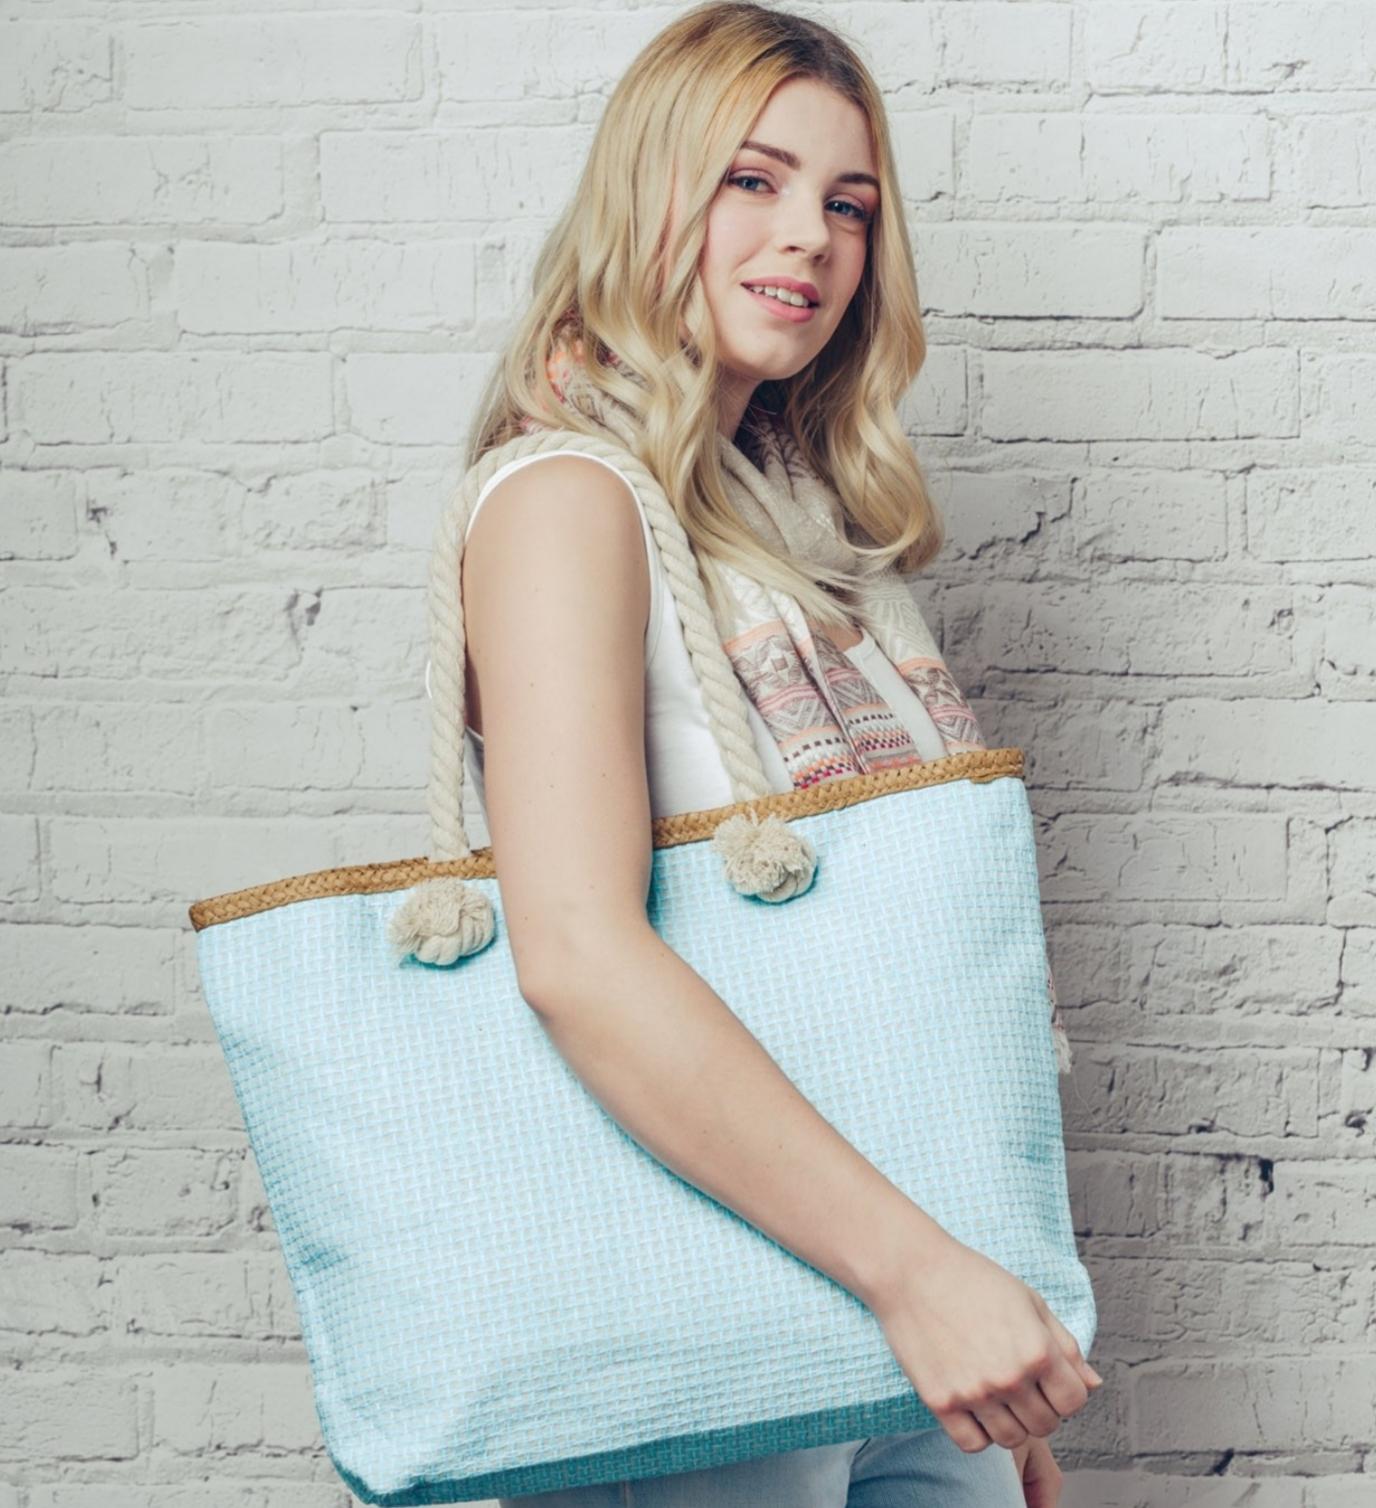 Beach bag. Turquoise